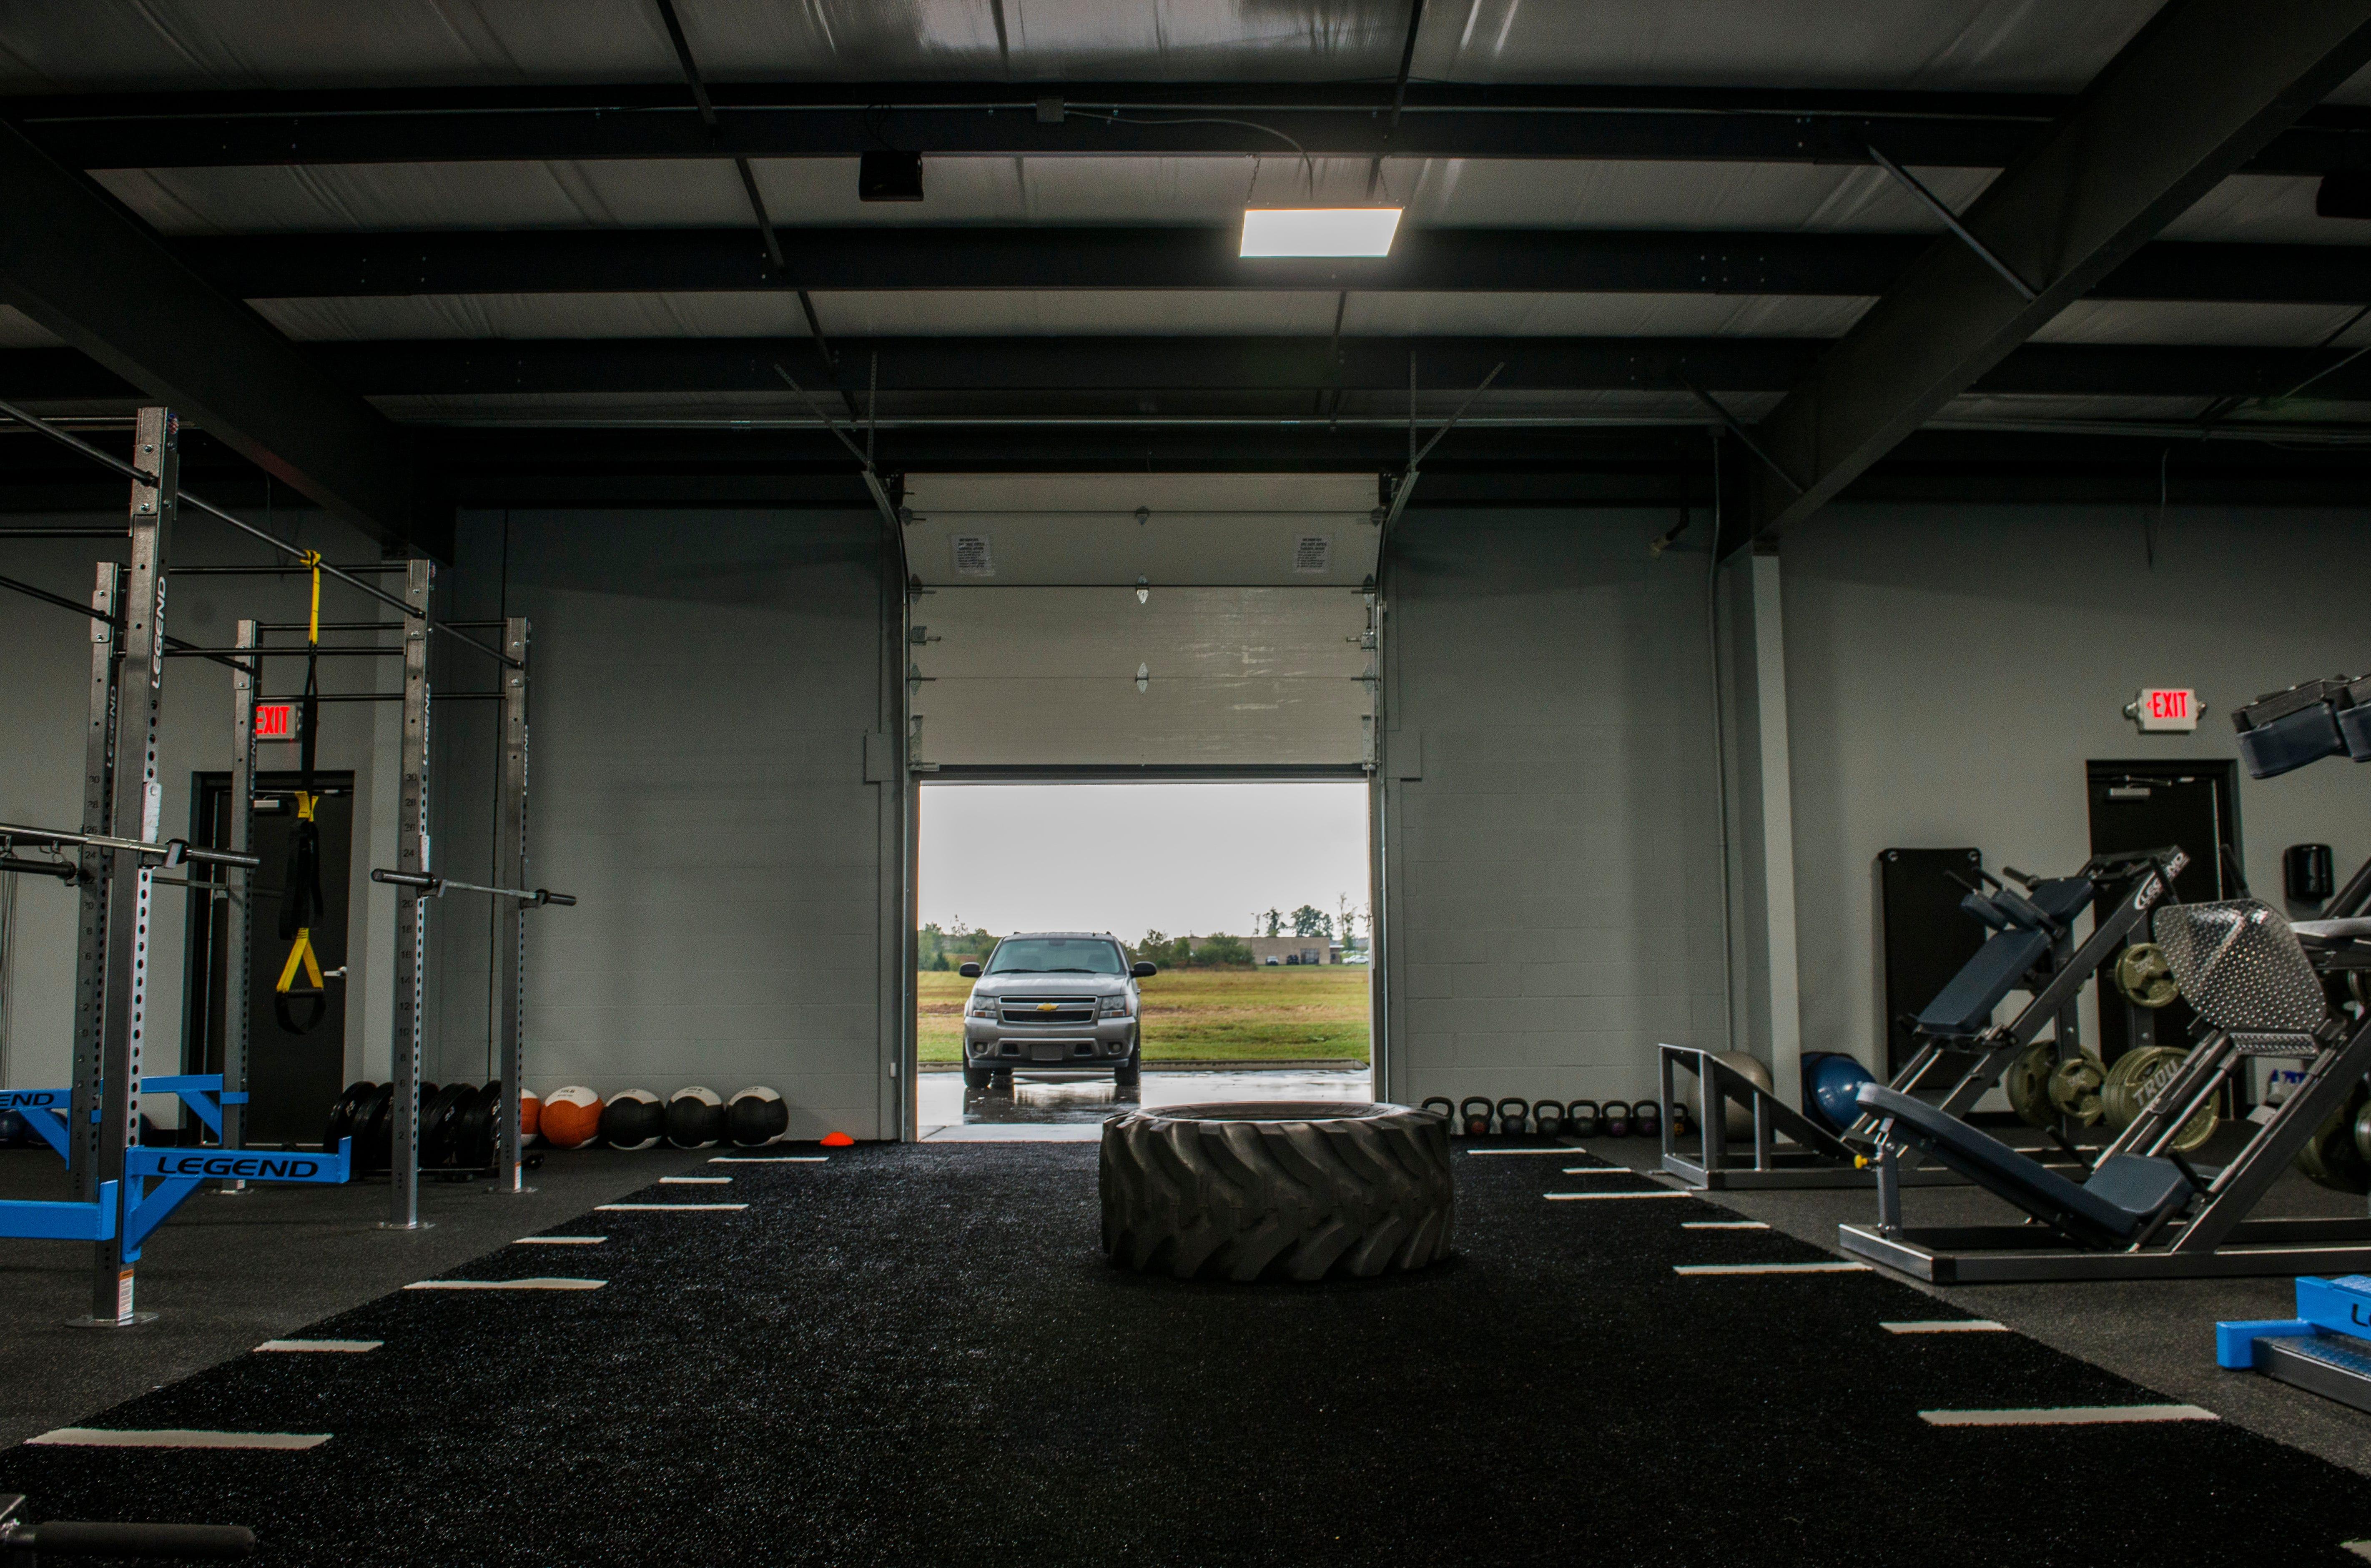 The garage fitness training facility antifeixista